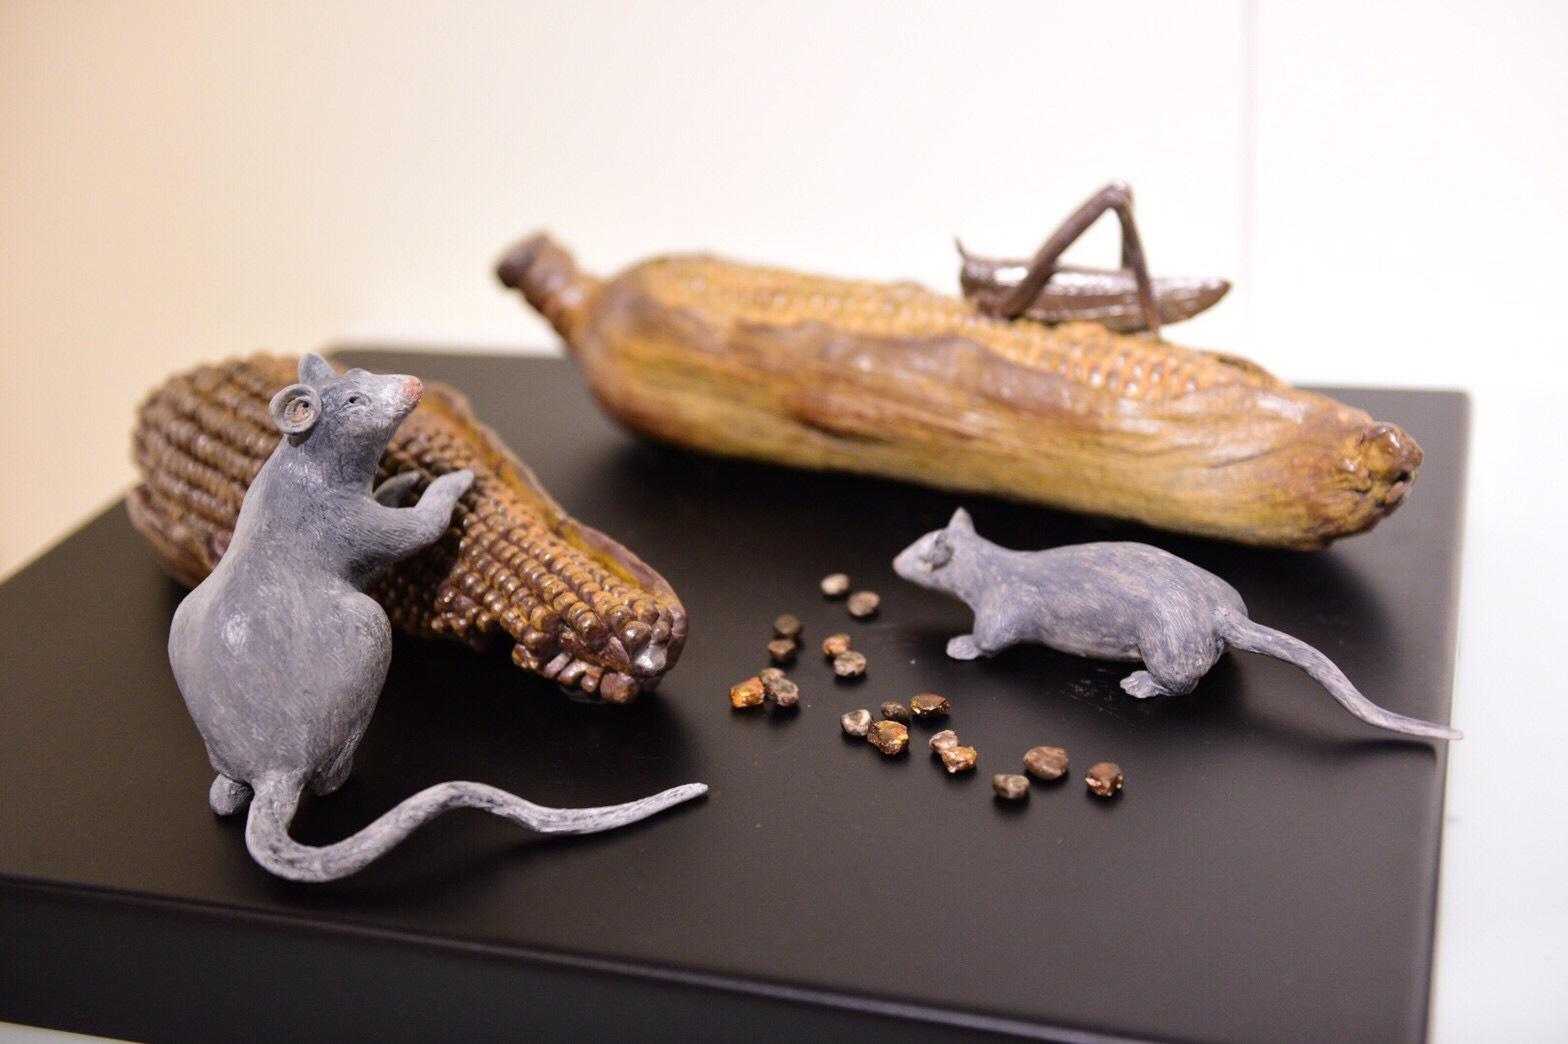 Image-「心有所鼠」-南投縣文化資產學會鼠年會員聯展